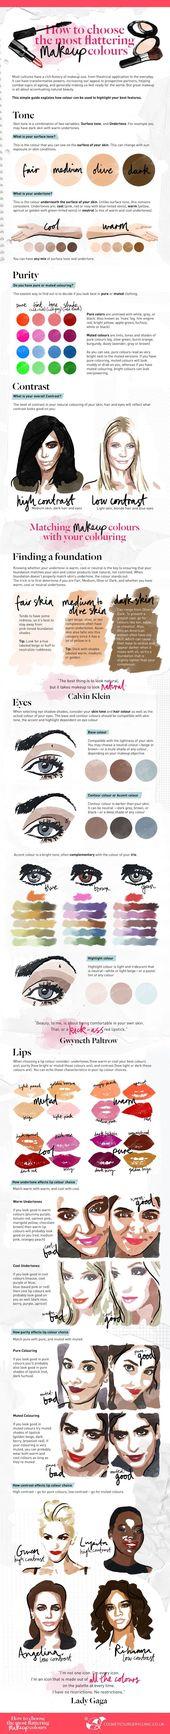 Makeup Guide | Makeup Colors By Skin Tone | Makeup Tutorials